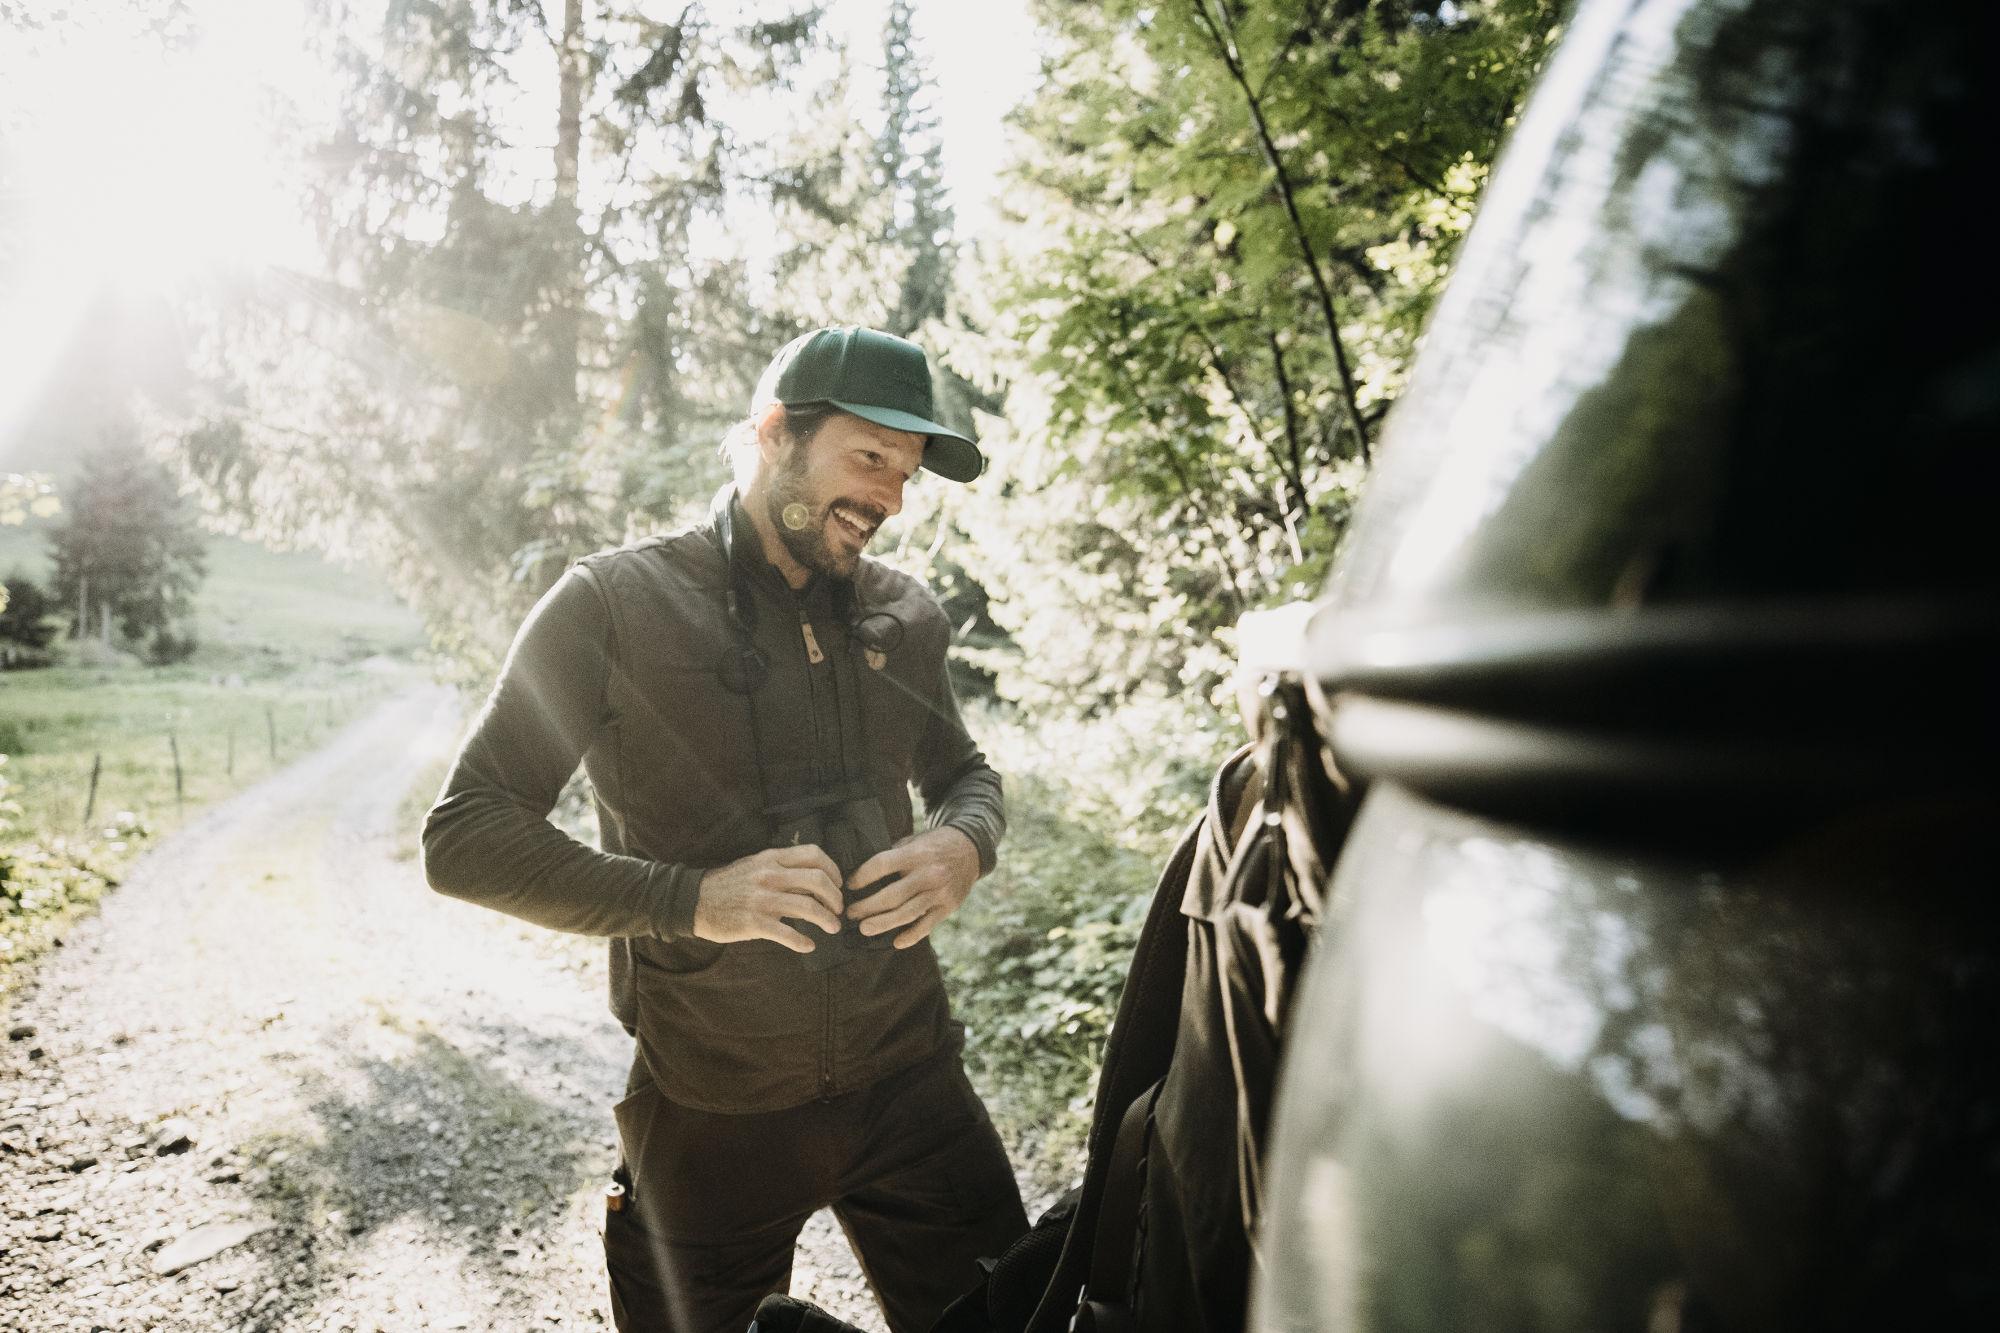 Leading a life as close to nature as possible – hunter and chef Markus Sämmer with SWAROVSKI OPTIK EL 10x42 binoculars (c)www.studio-steve.de